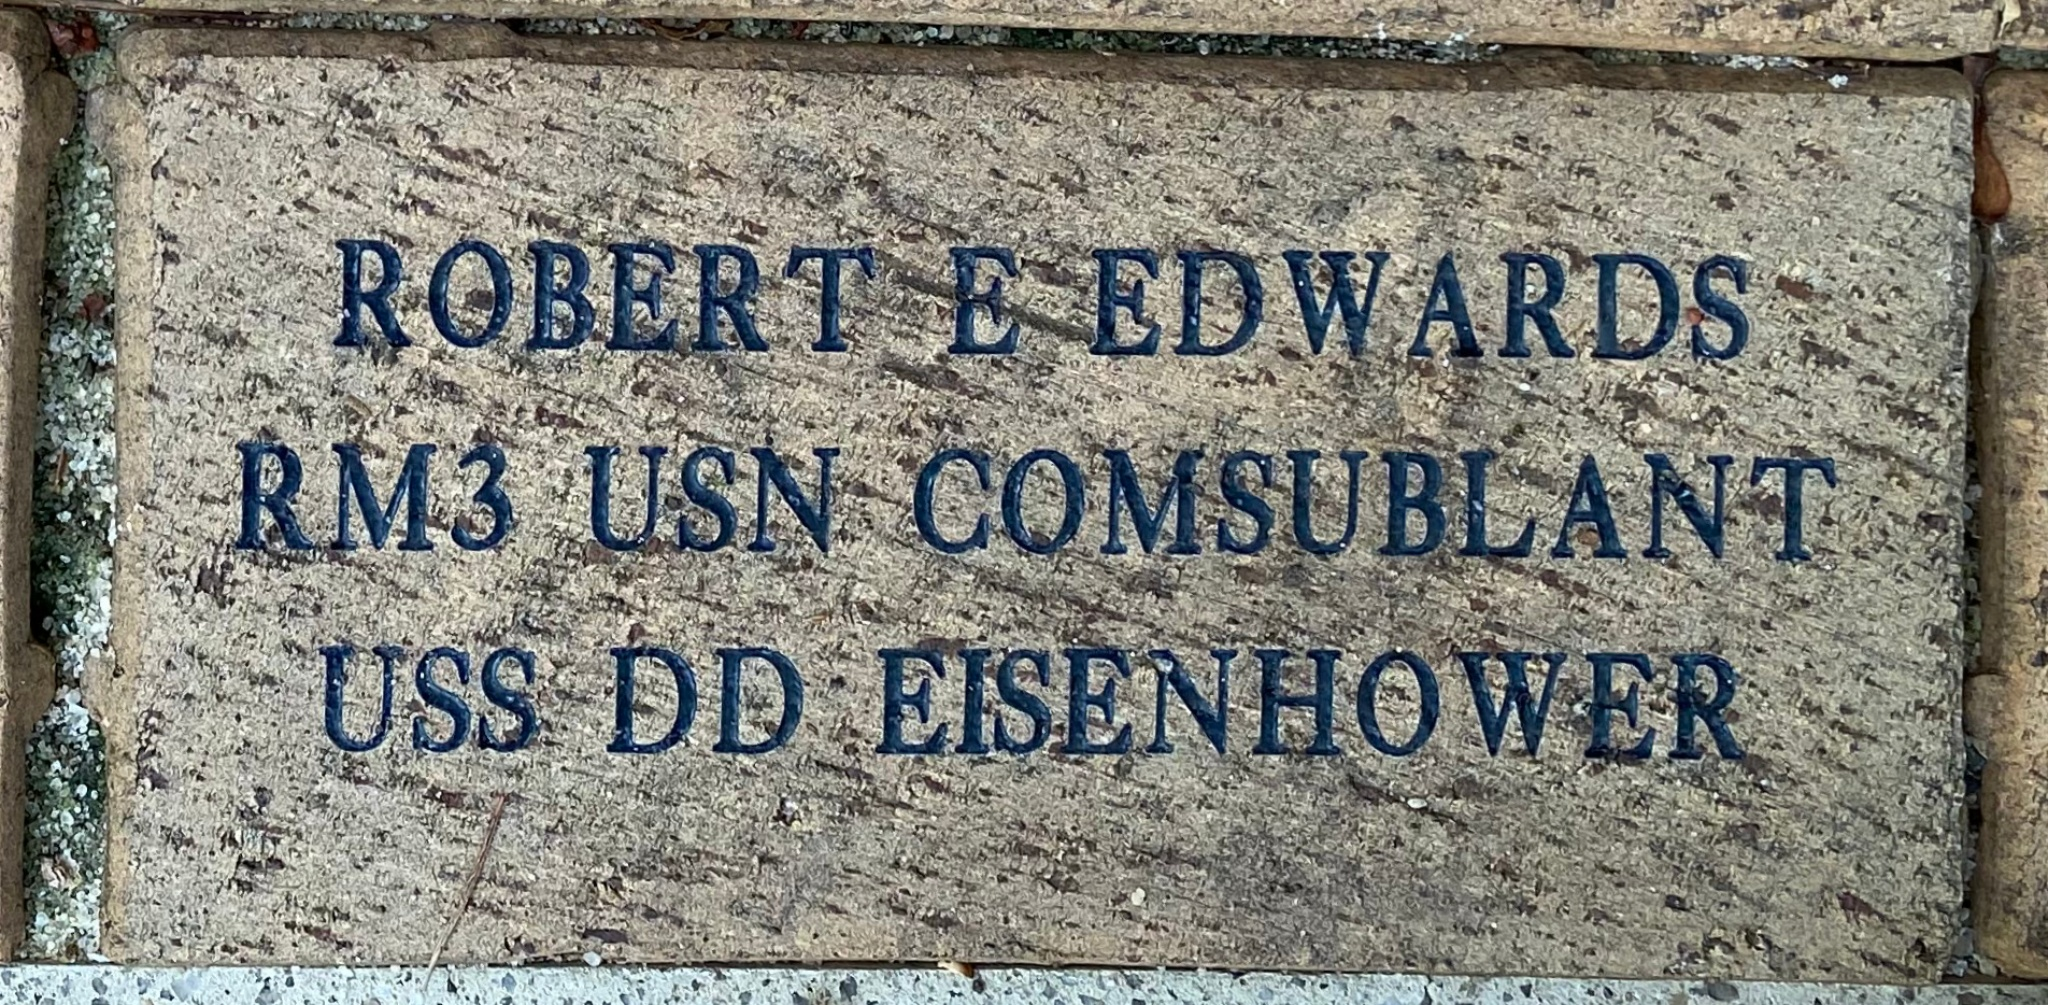 ROBERT E EDWARDS RM3 USN COMSUBLANT USS DD EISENHOWER